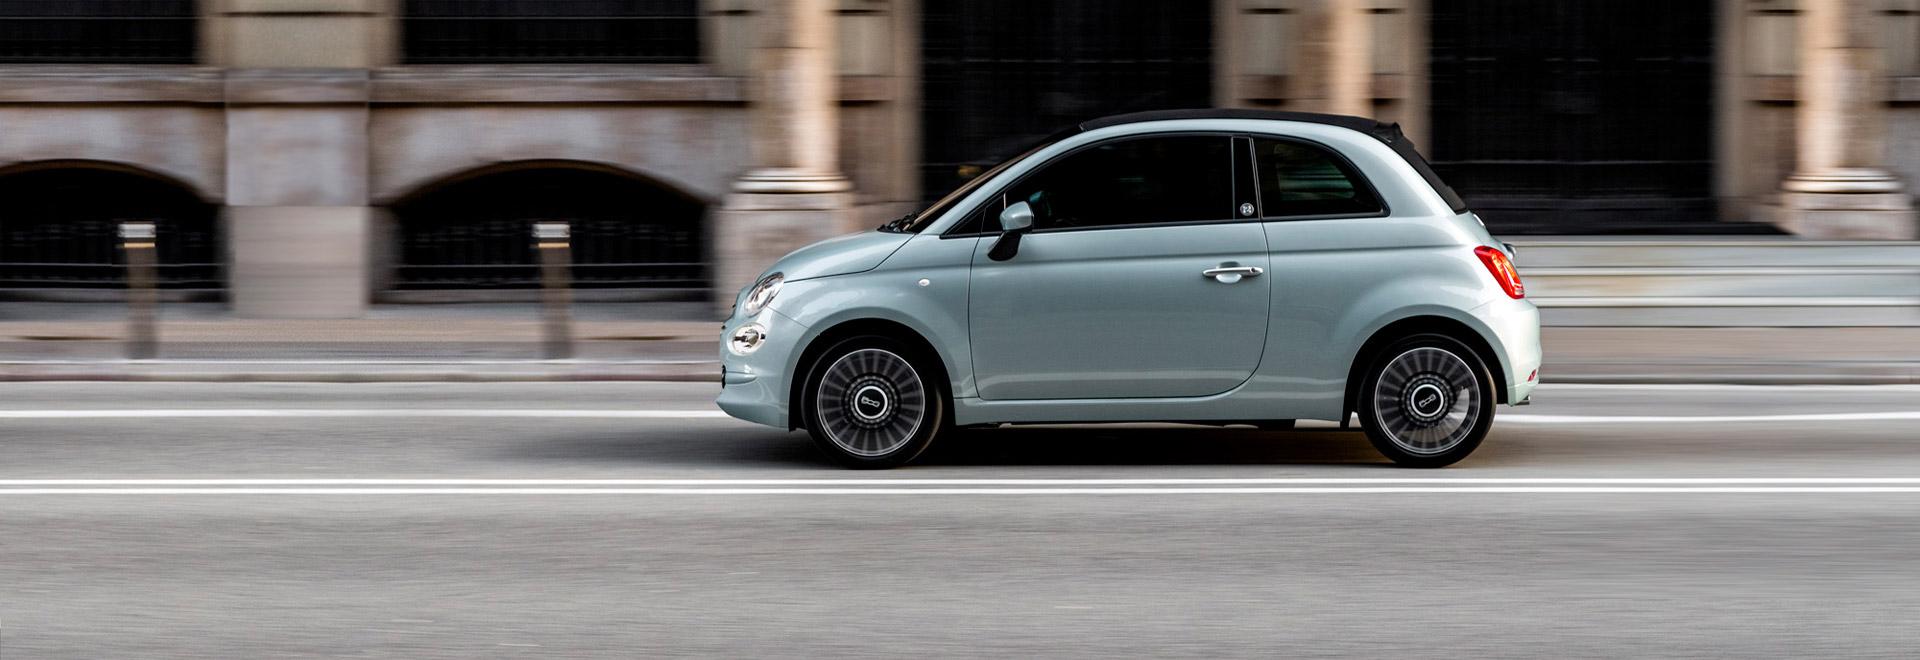 Fiat 500 loyalty dicounts